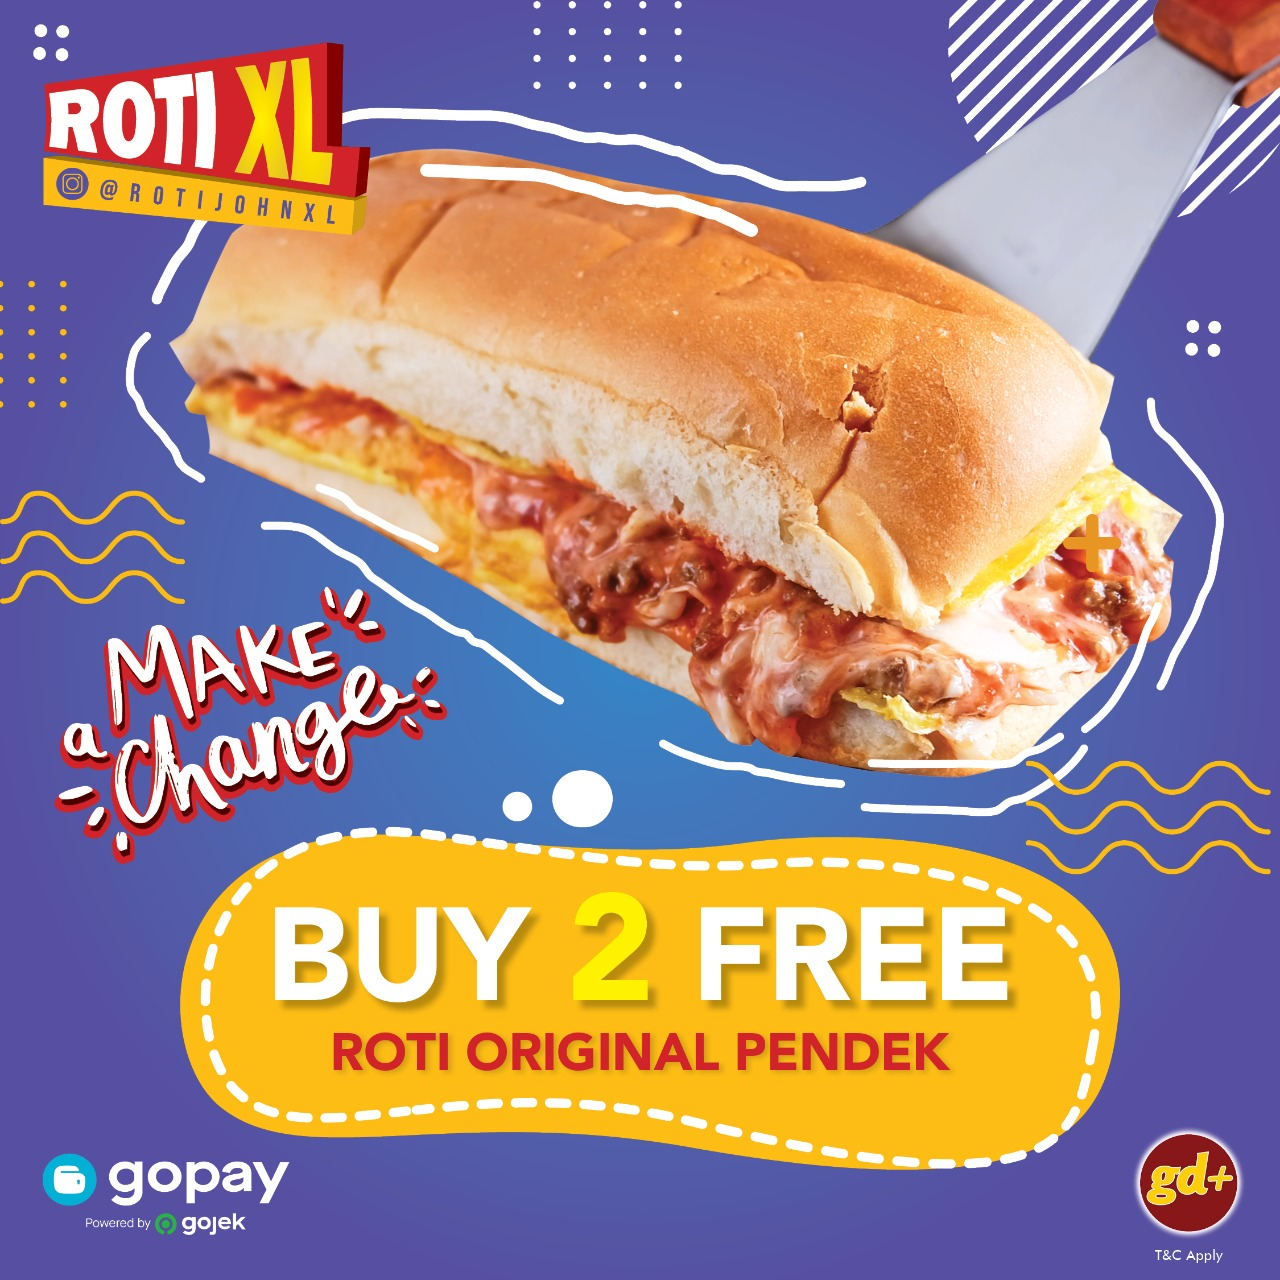 Roti XL Promo Buy 2 Get Free Roti Original Pendek